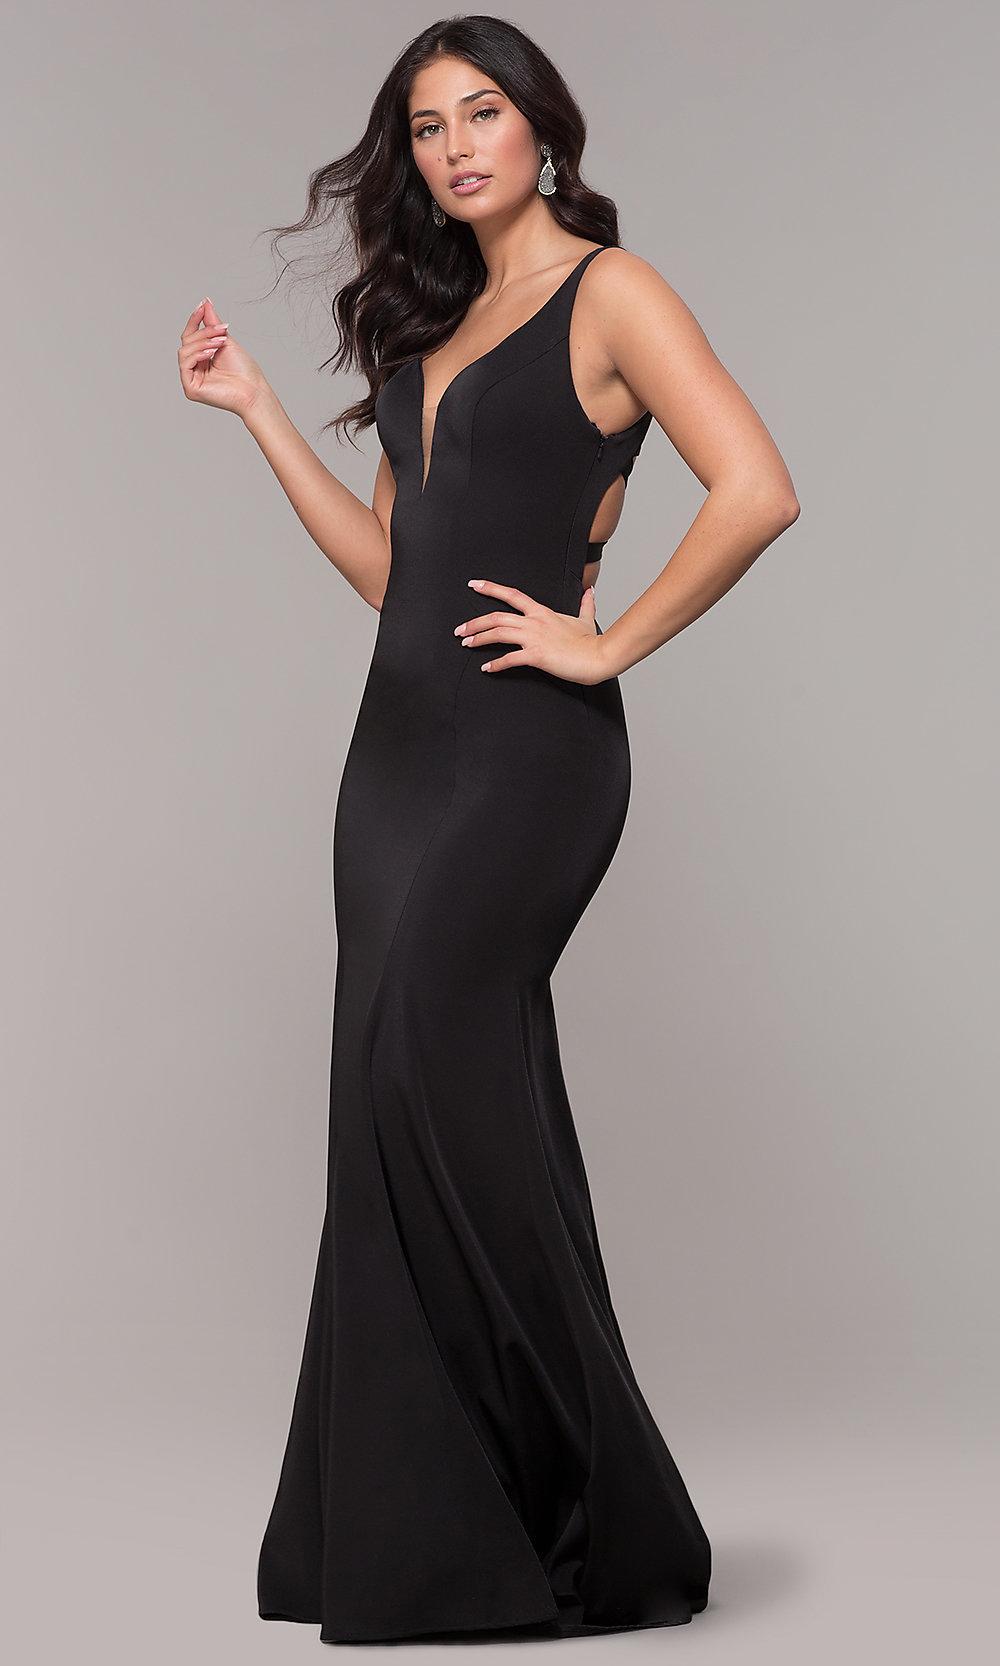 Long open-caged-back Black prom dress